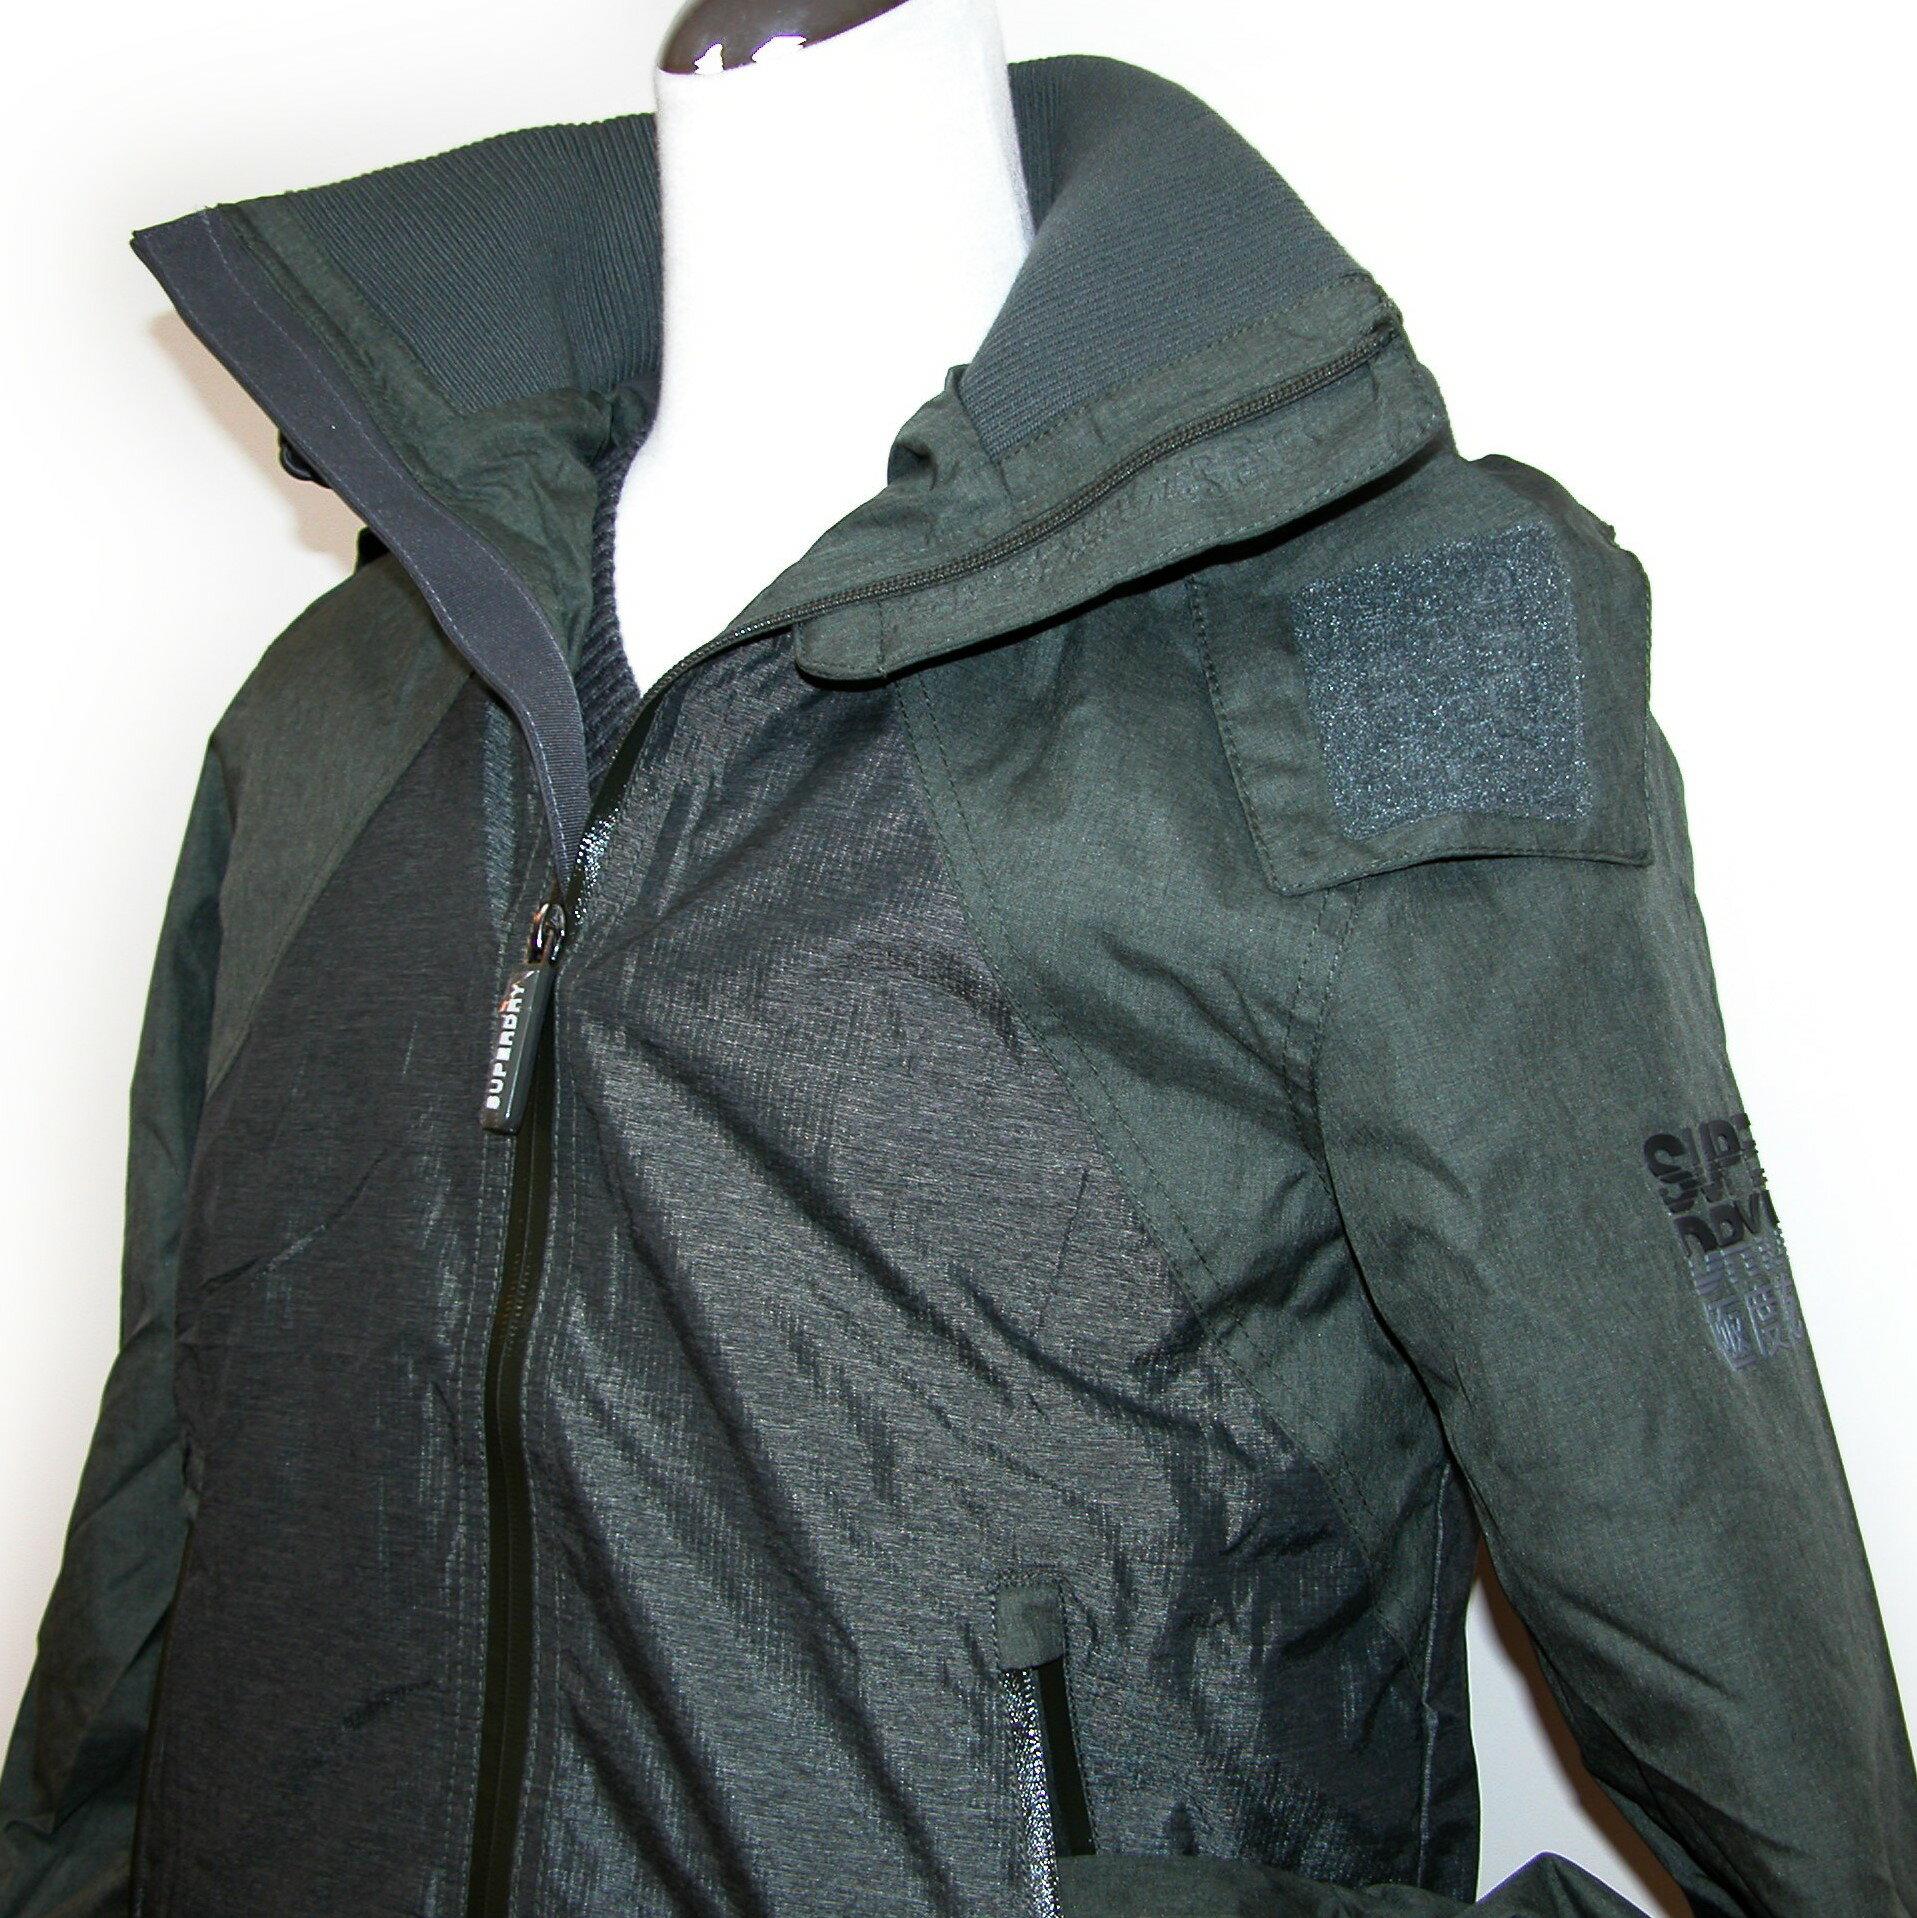 Superdry (M50014RPS JK3)arctic hooded cliff hiker hybrid男連帽防風夾克(綠色/灰) / 全新美國公司貨 【119 小鋪】